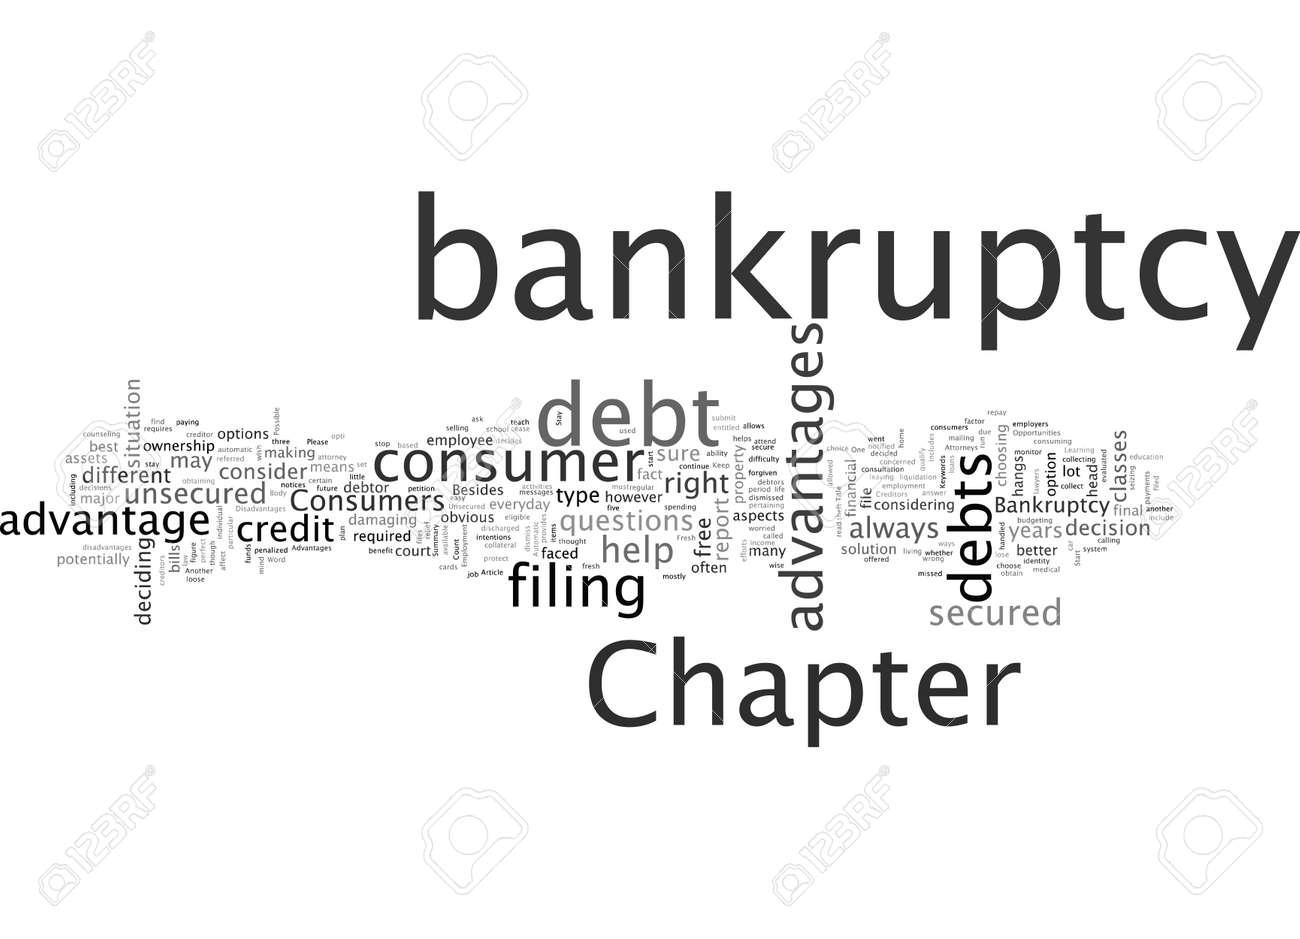 Advantages Of Bankruptcy - 132107684